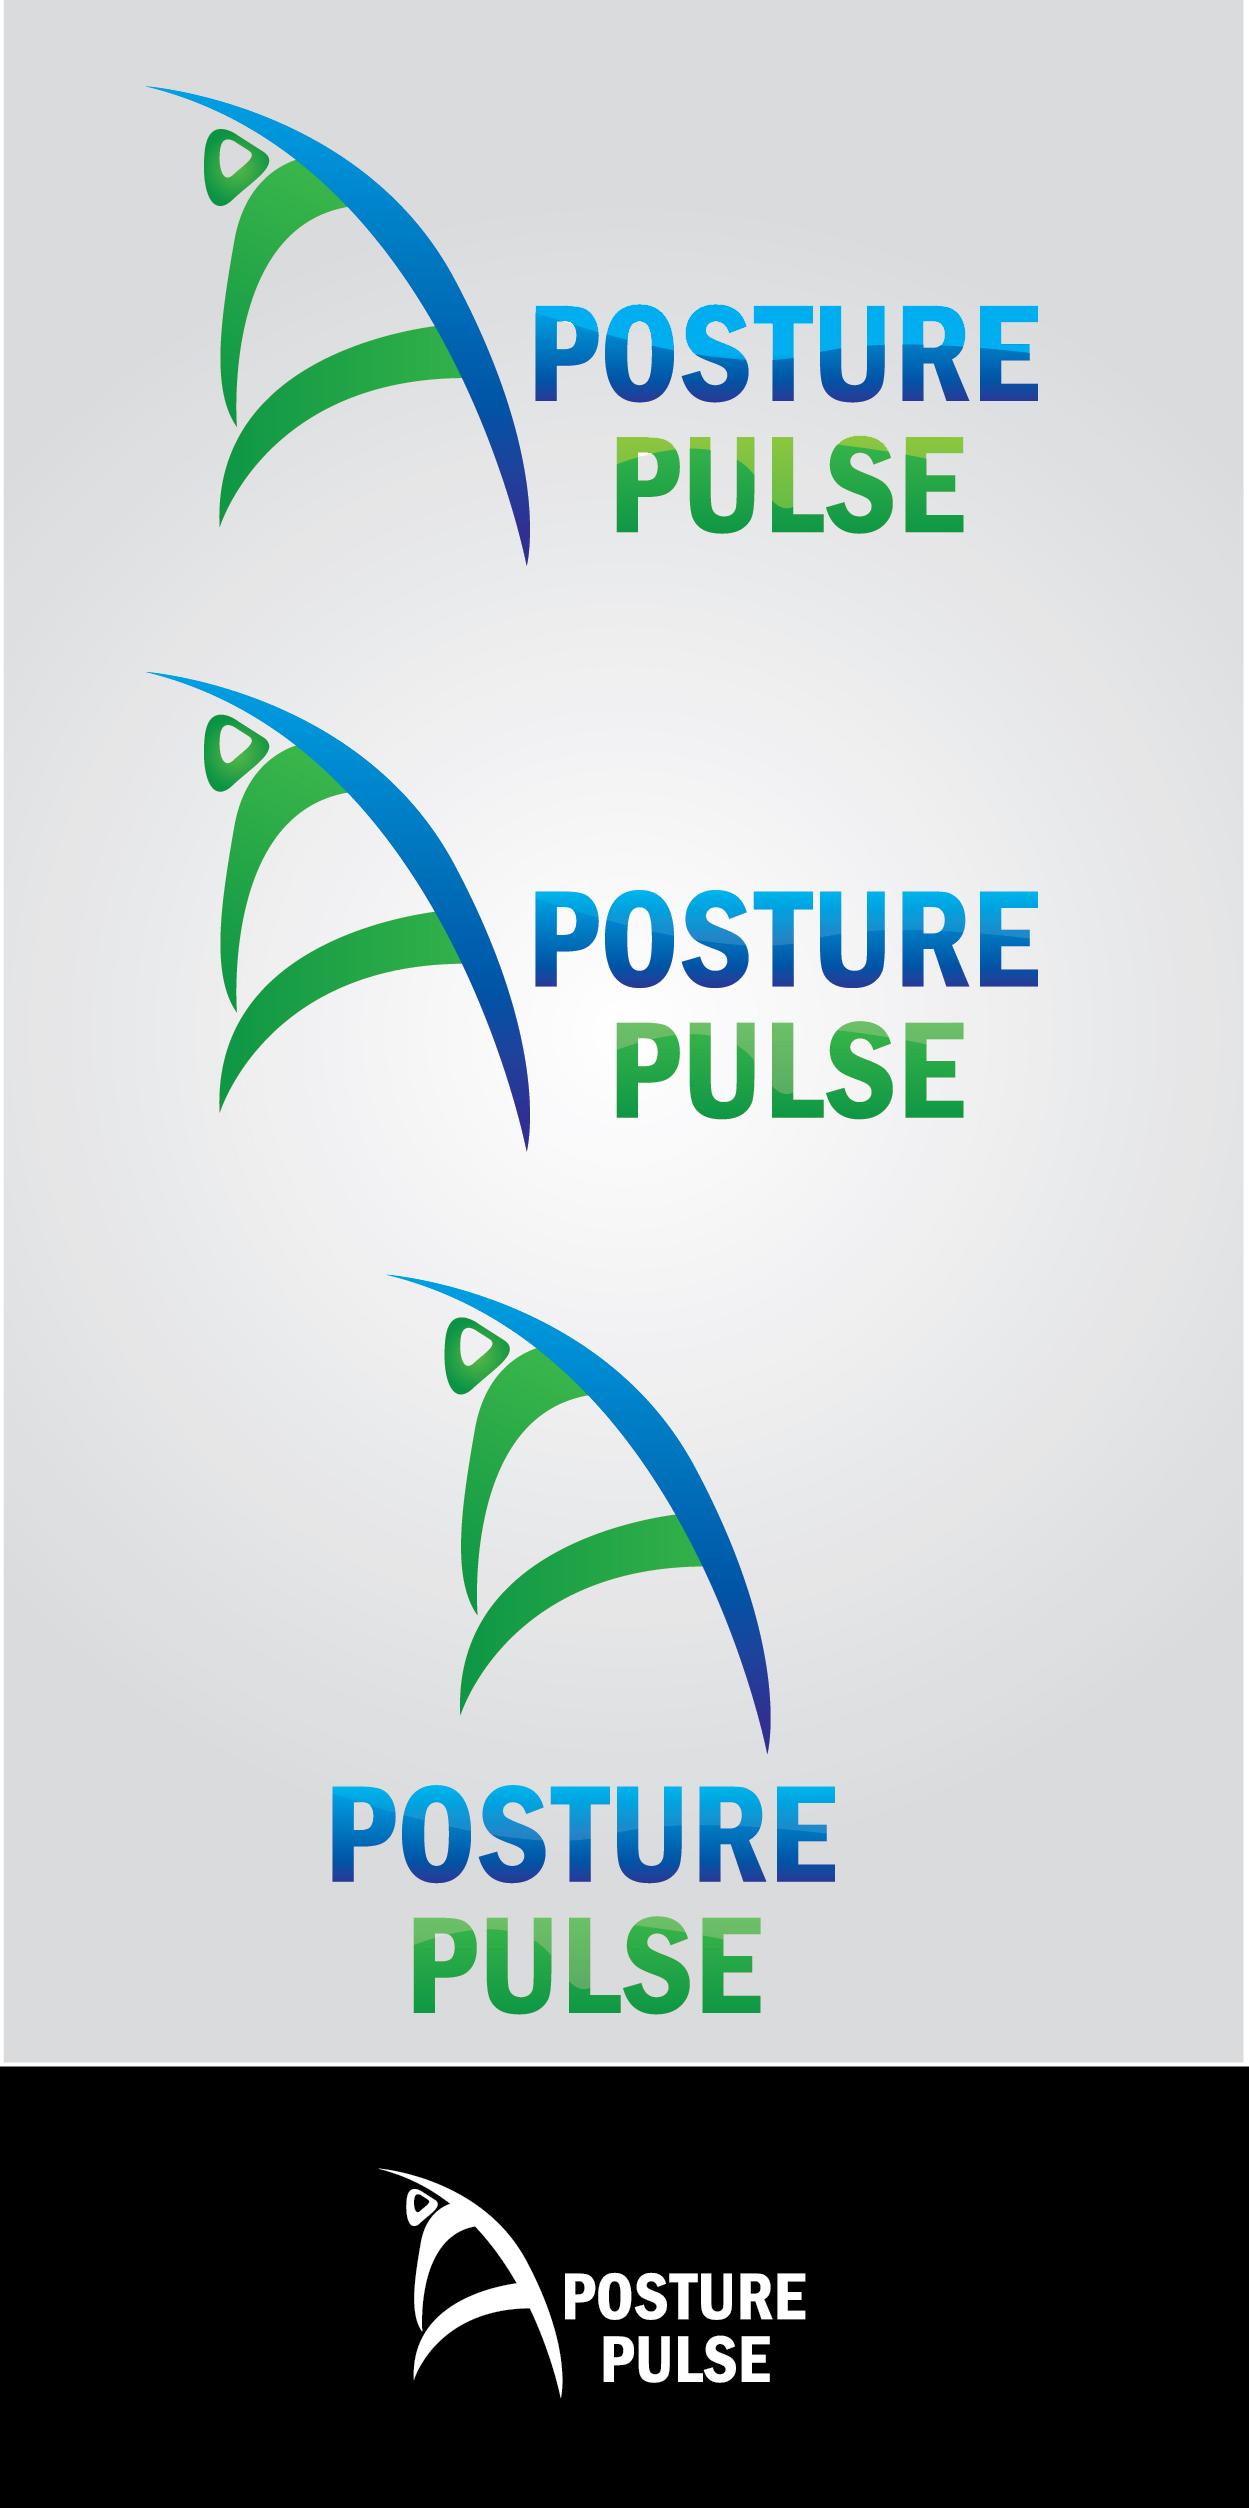 Logo Design by mediaproductionart - Entry No. 62 in the Logo Design Contest Unique Logo Design Wanted for PosturePulse.